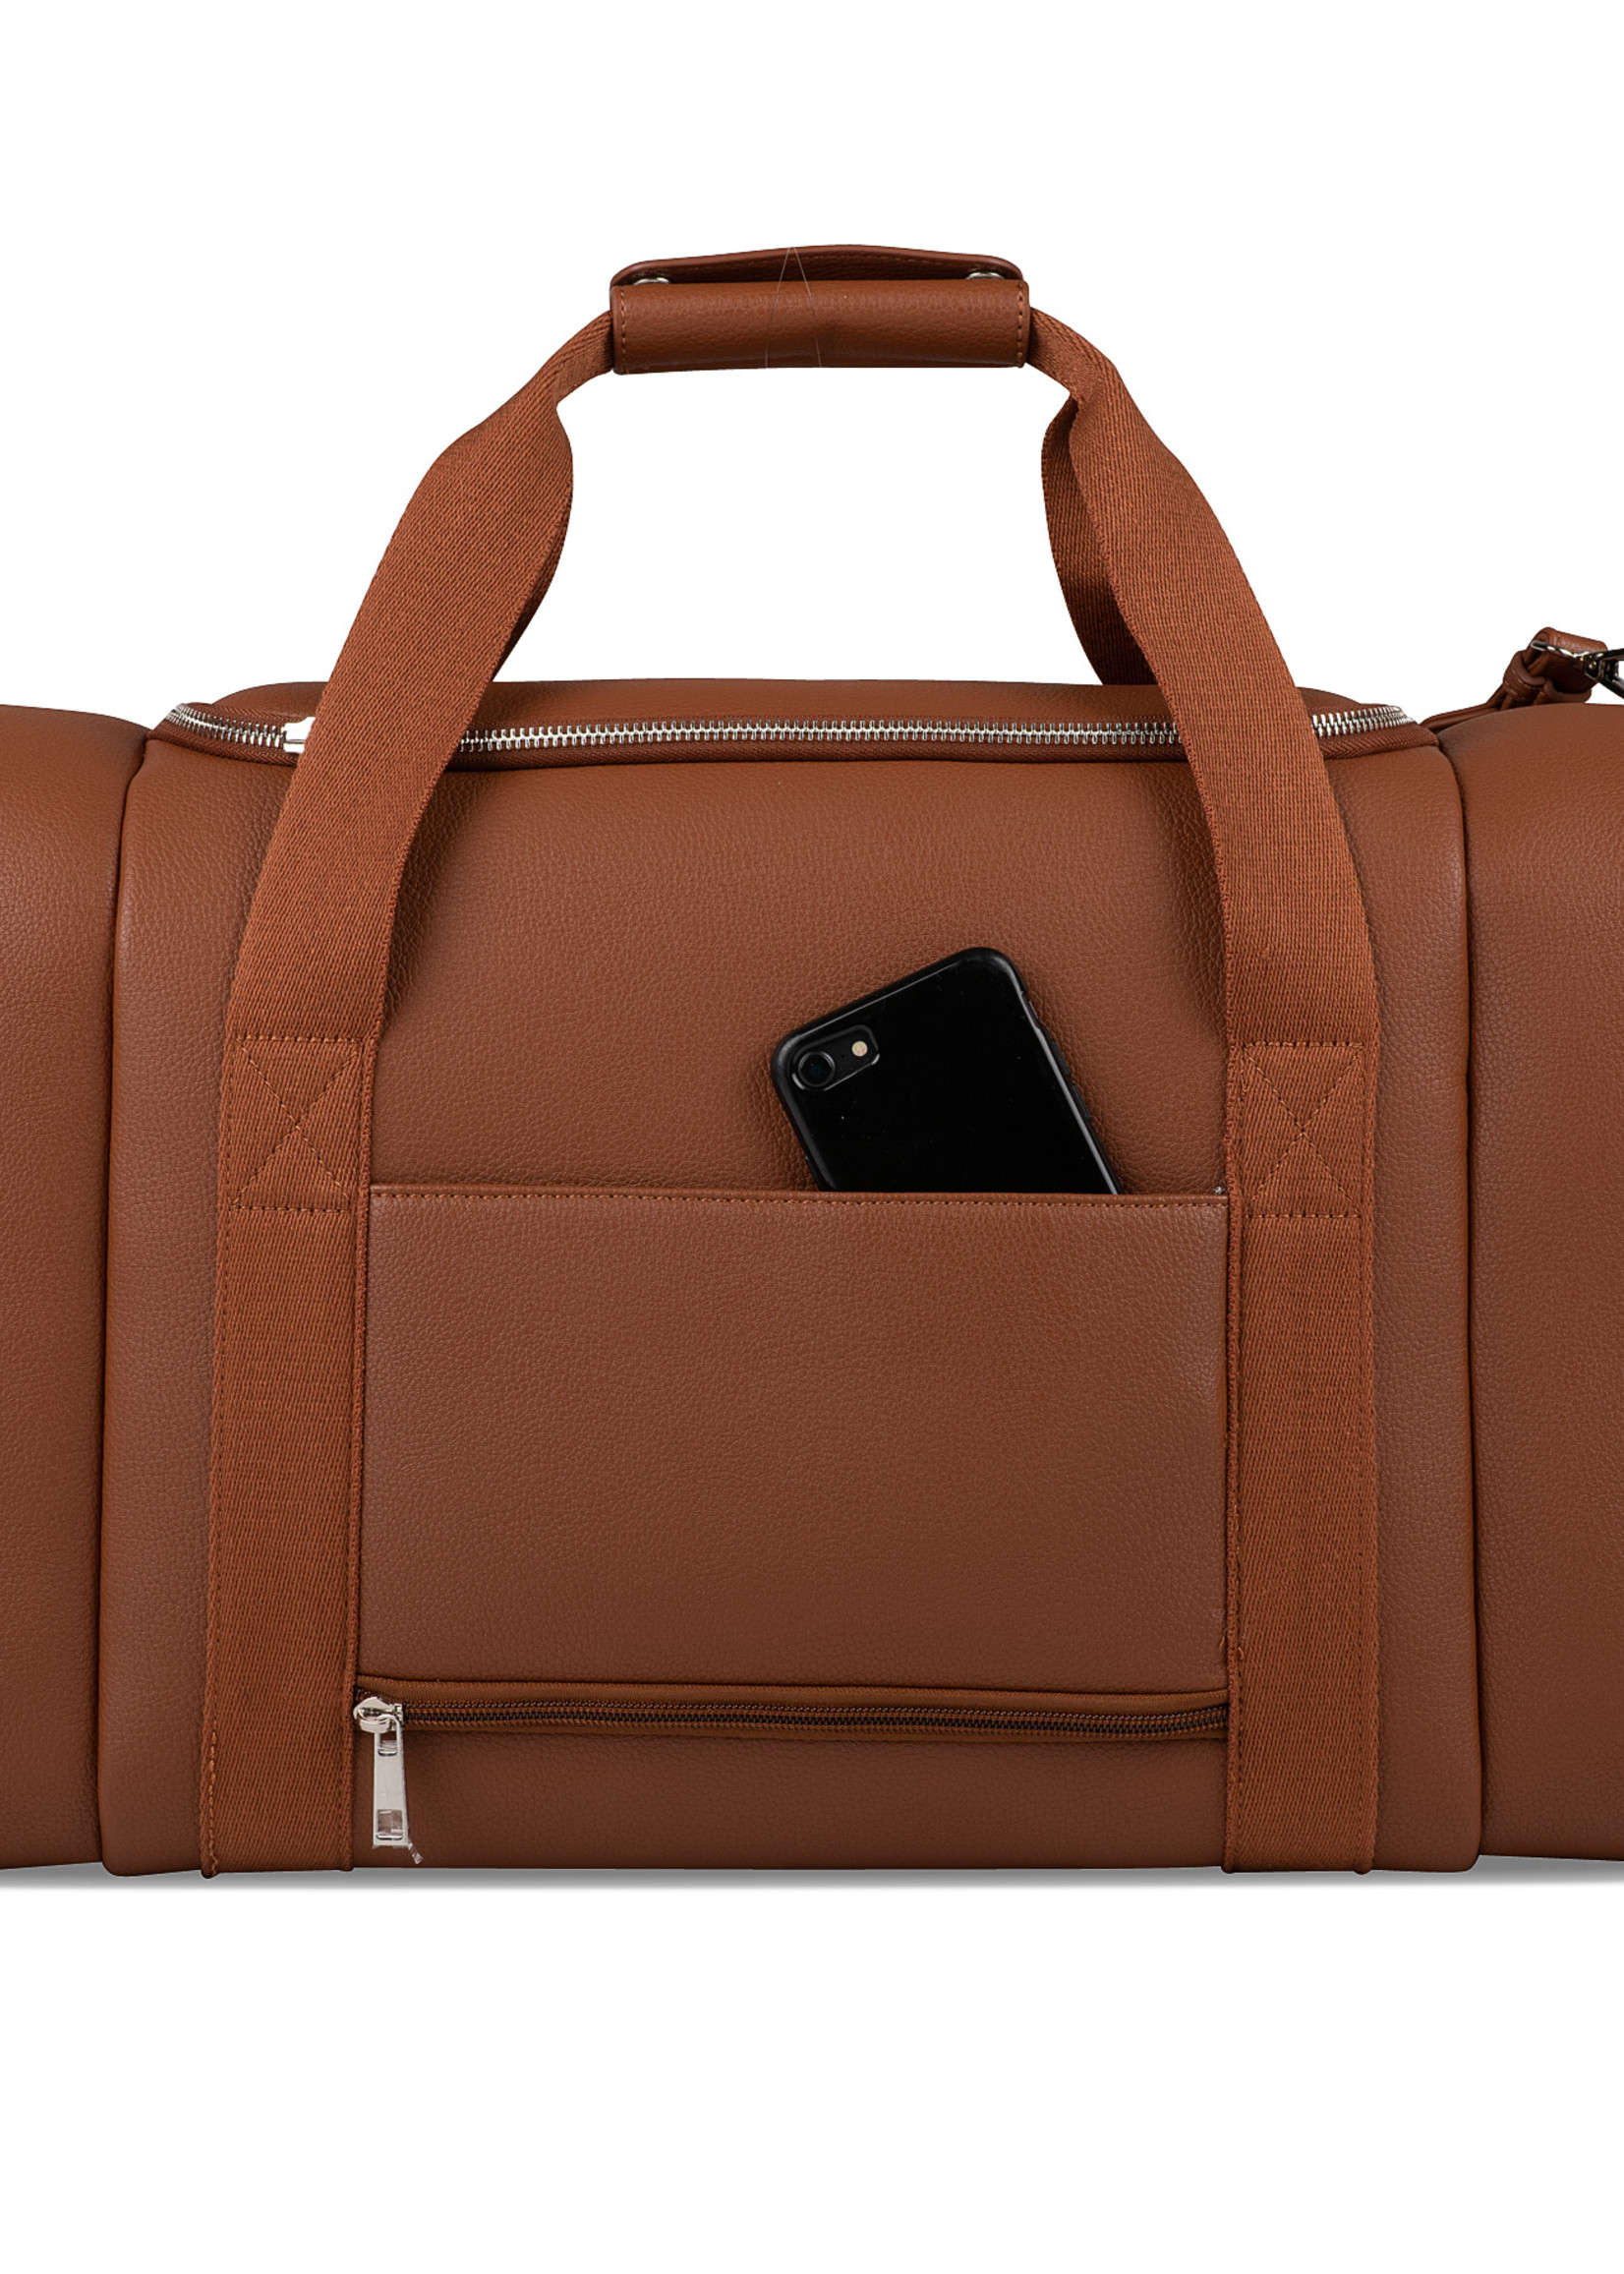 Lambert The SIDNEY Vegan Leather Multifunctional Unisex Bag